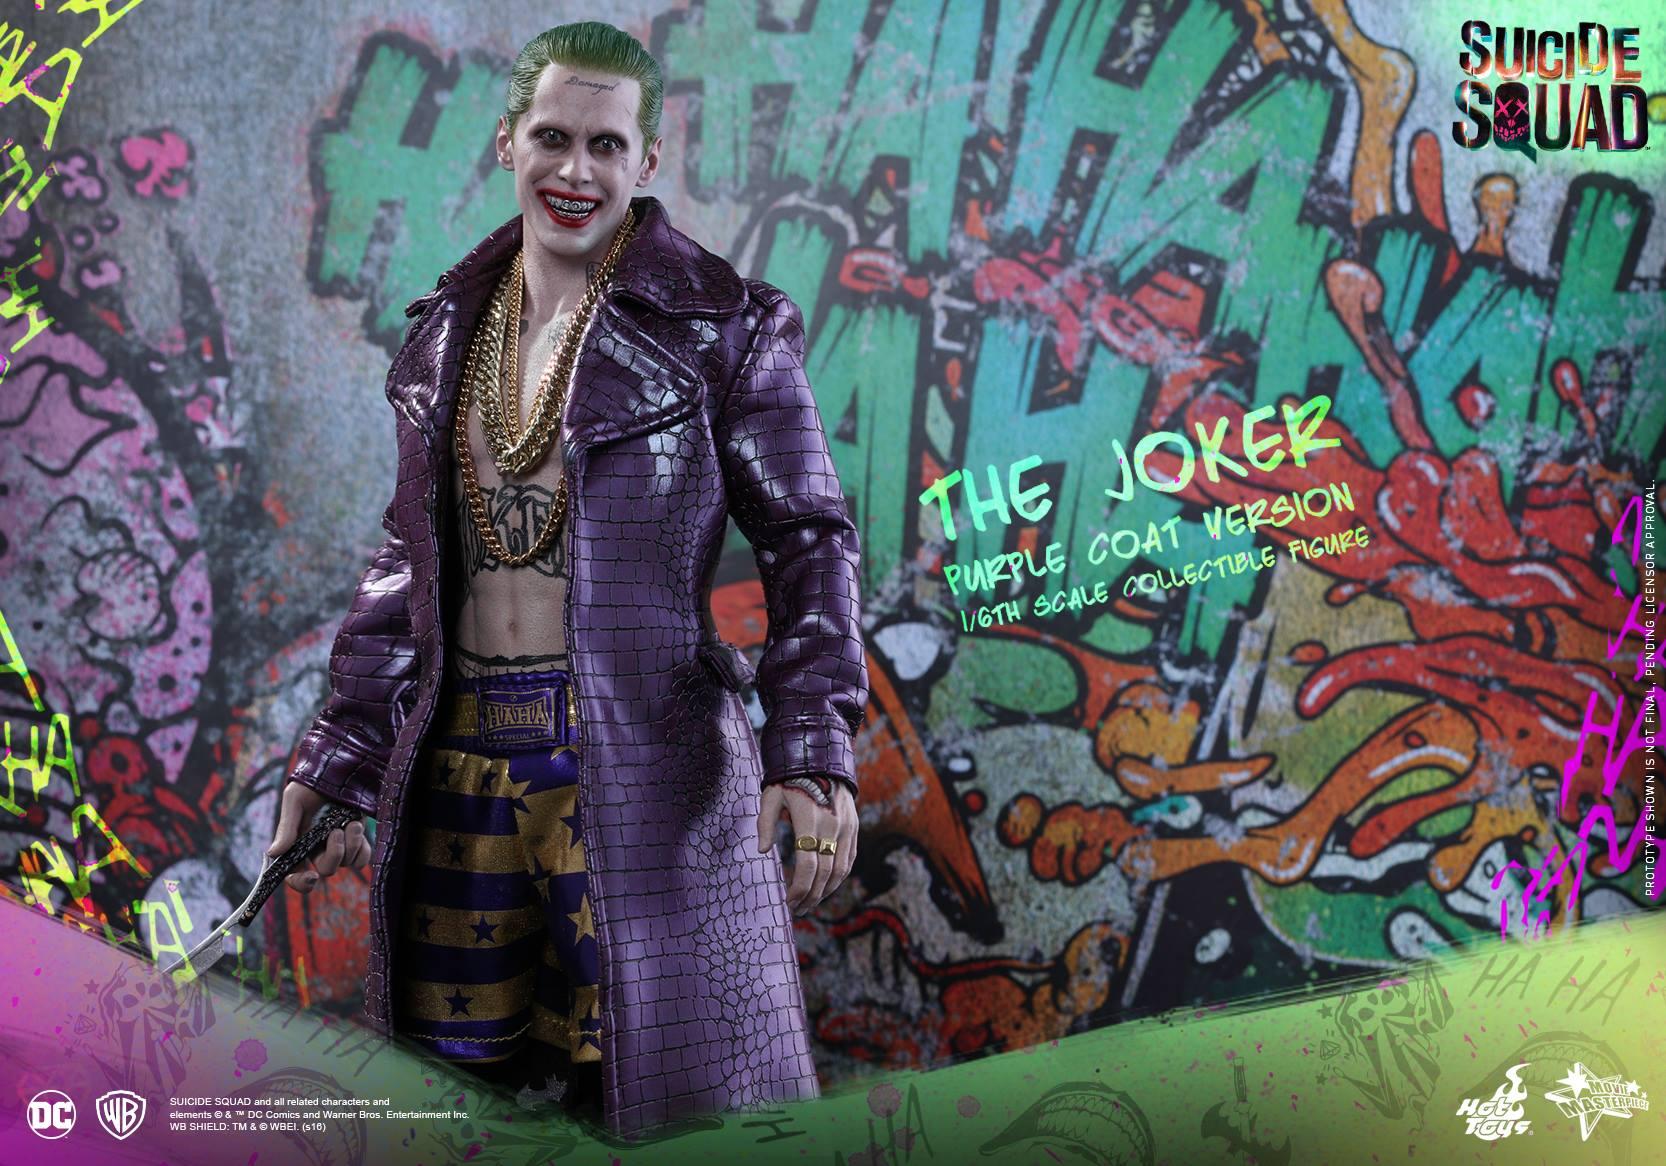 Hot-Toys-Suicide-Squad-Joker-Purple-Coat-7